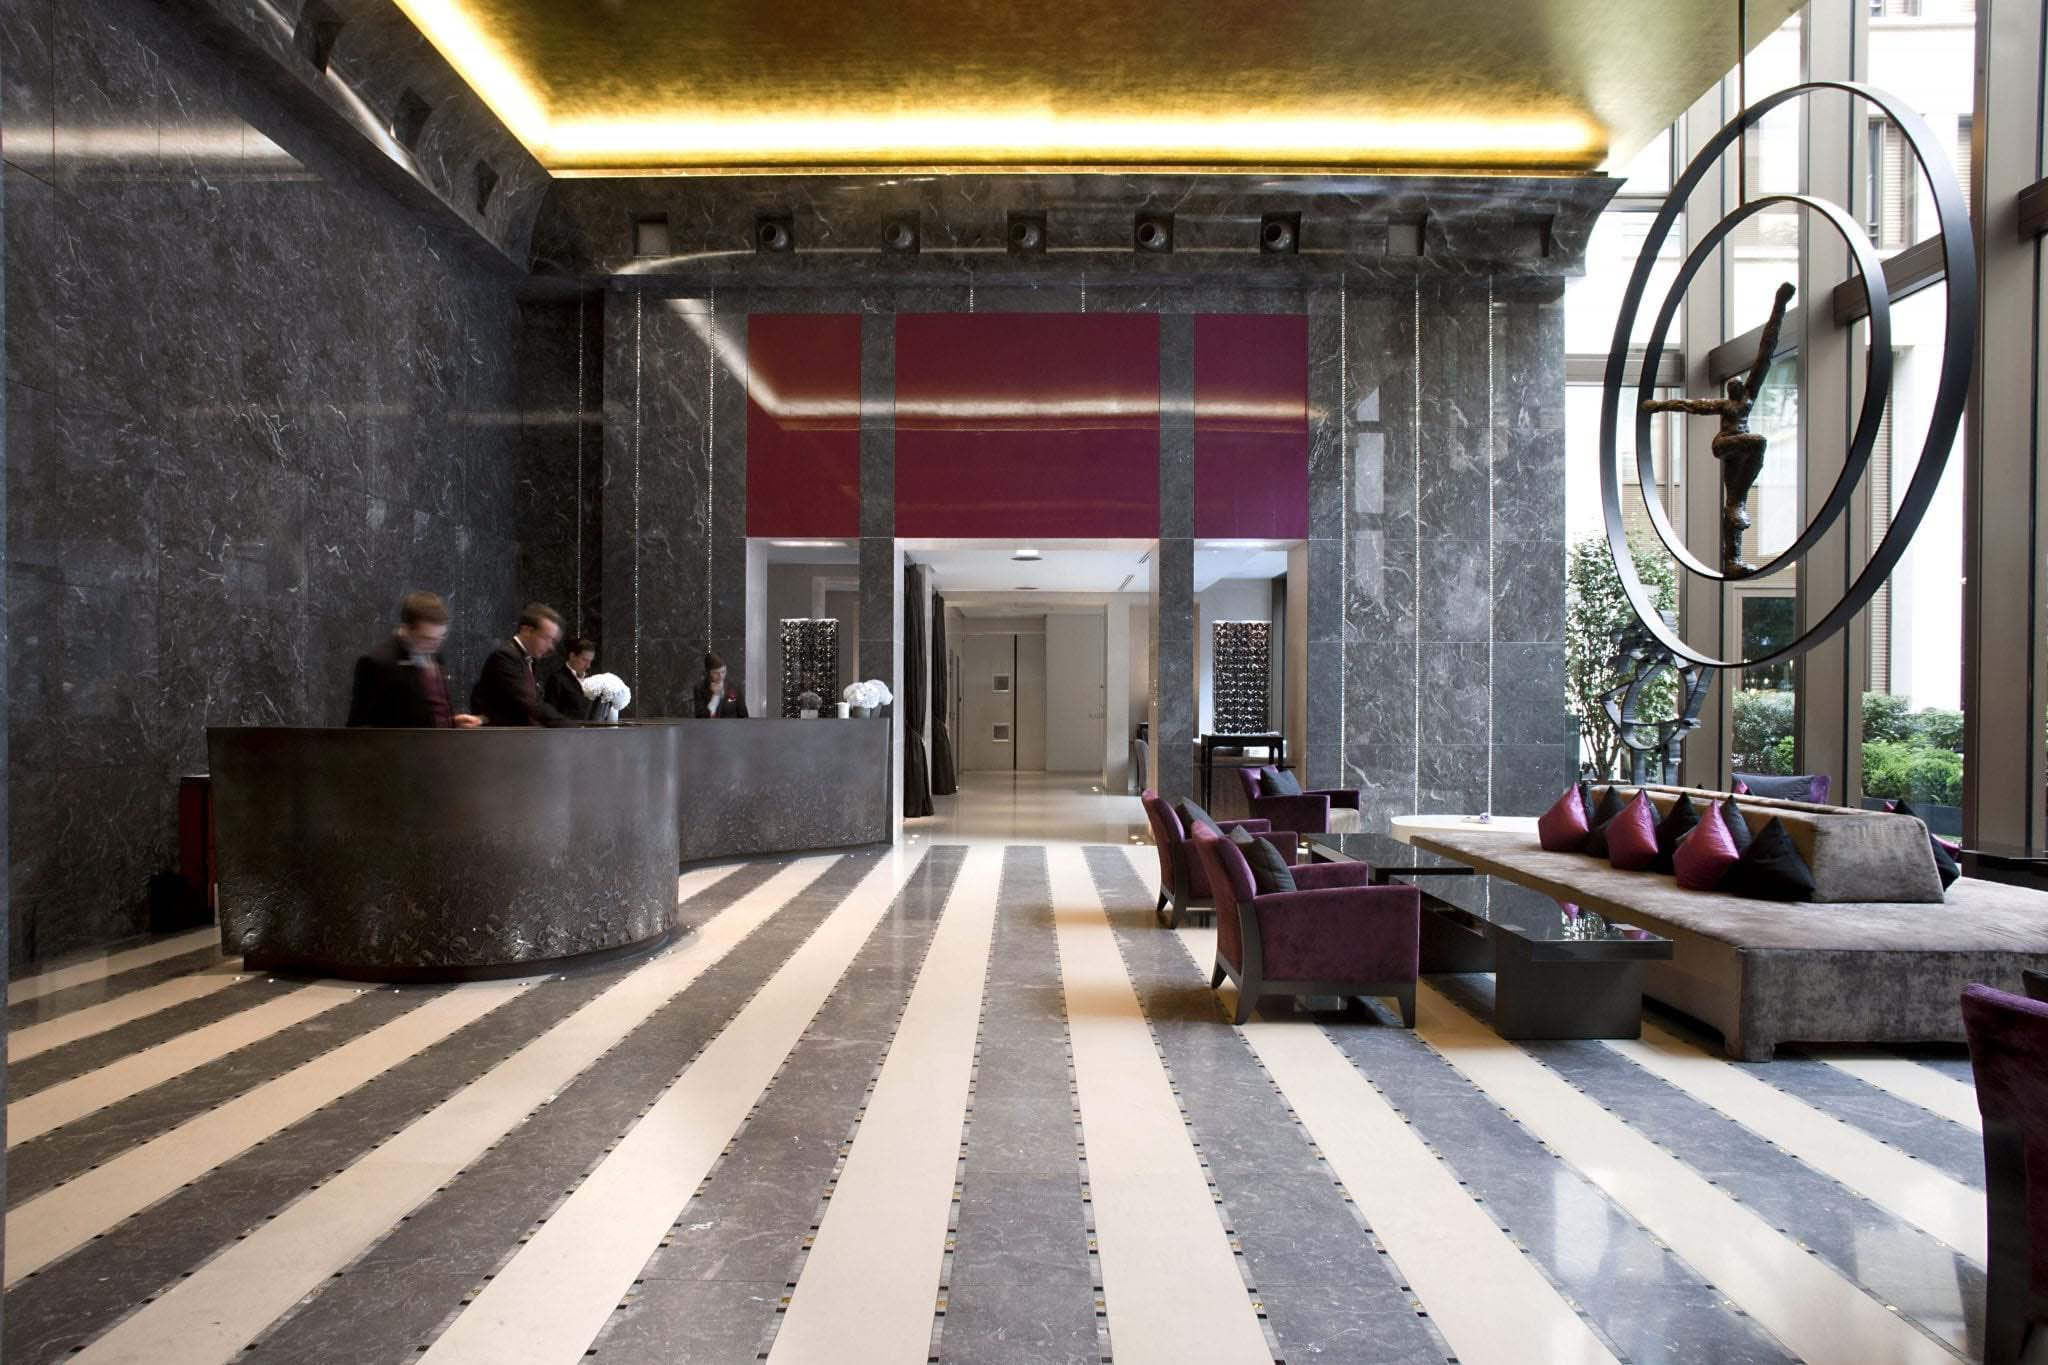 Mandarin Oriental Hotel in Paris France